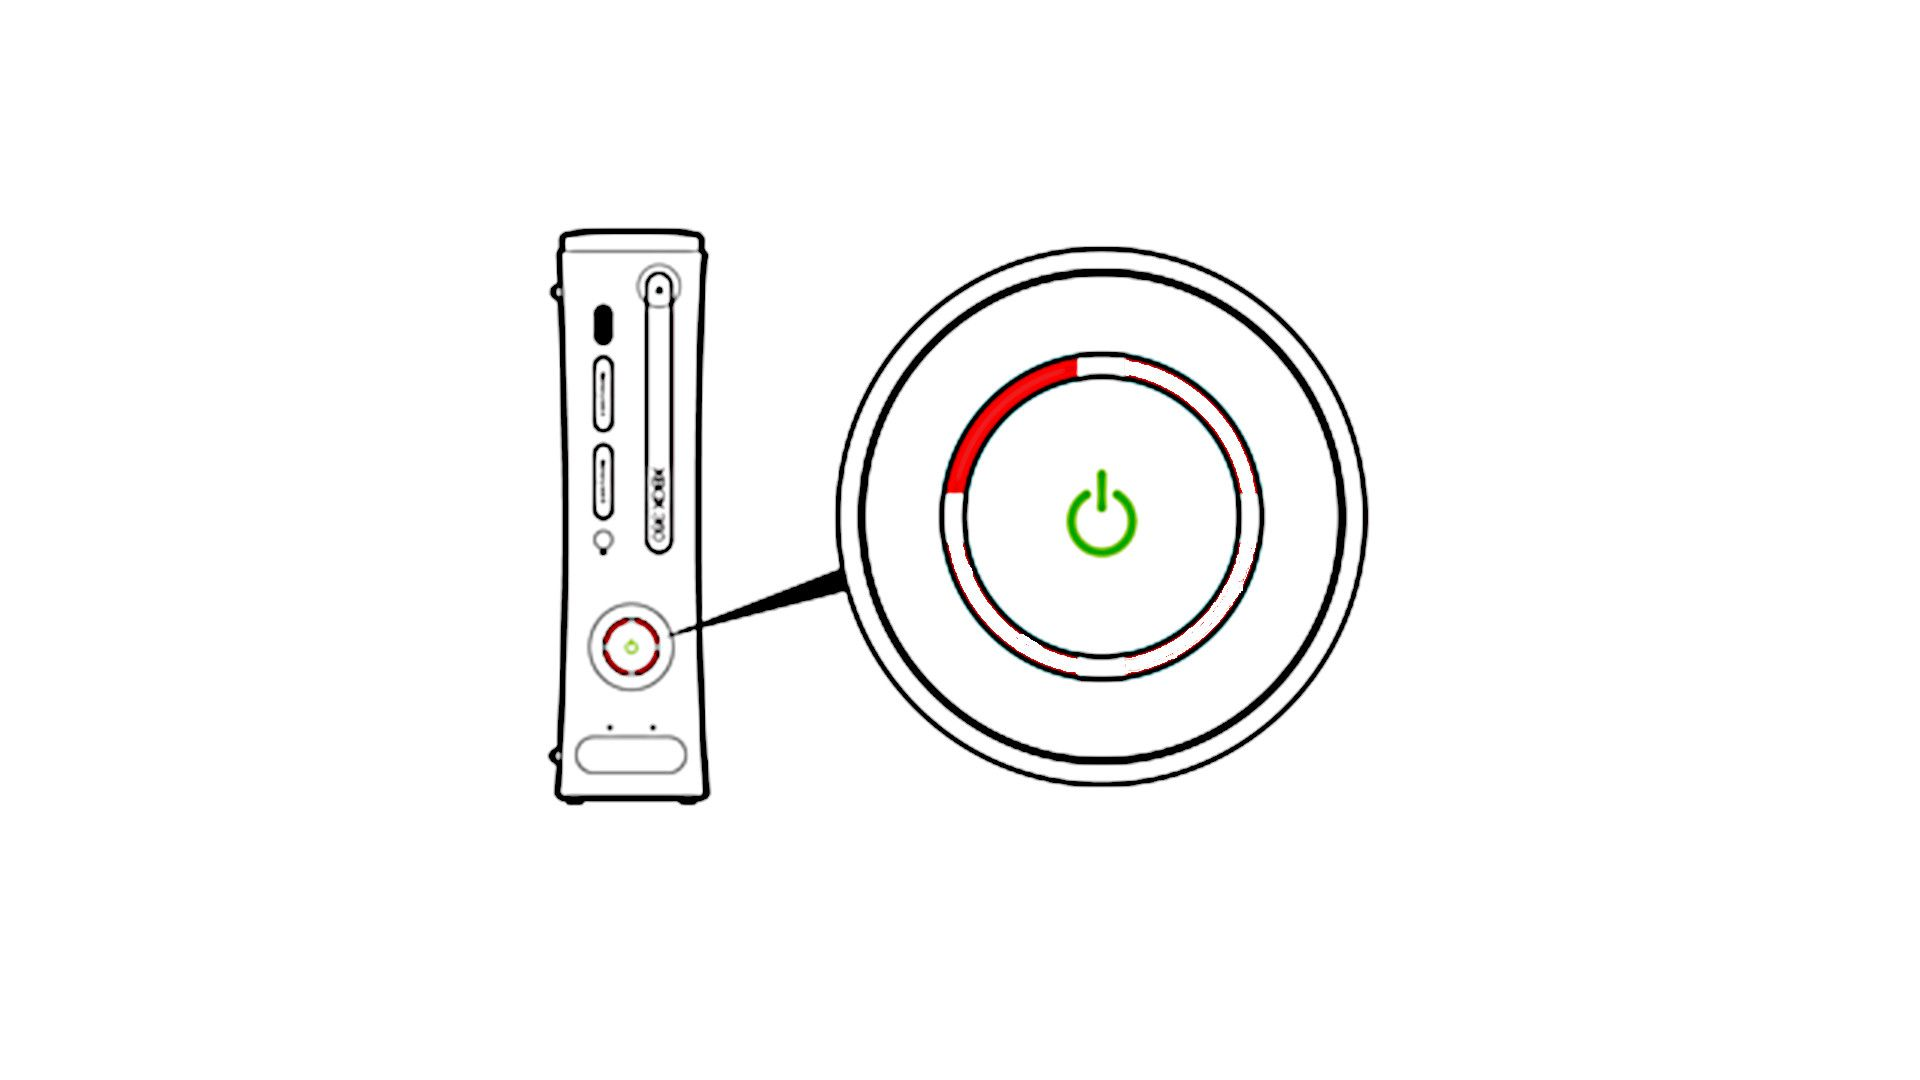 how to fix your xbox 360 u0026 39 s  u0026 39 red ring of death u0026 39